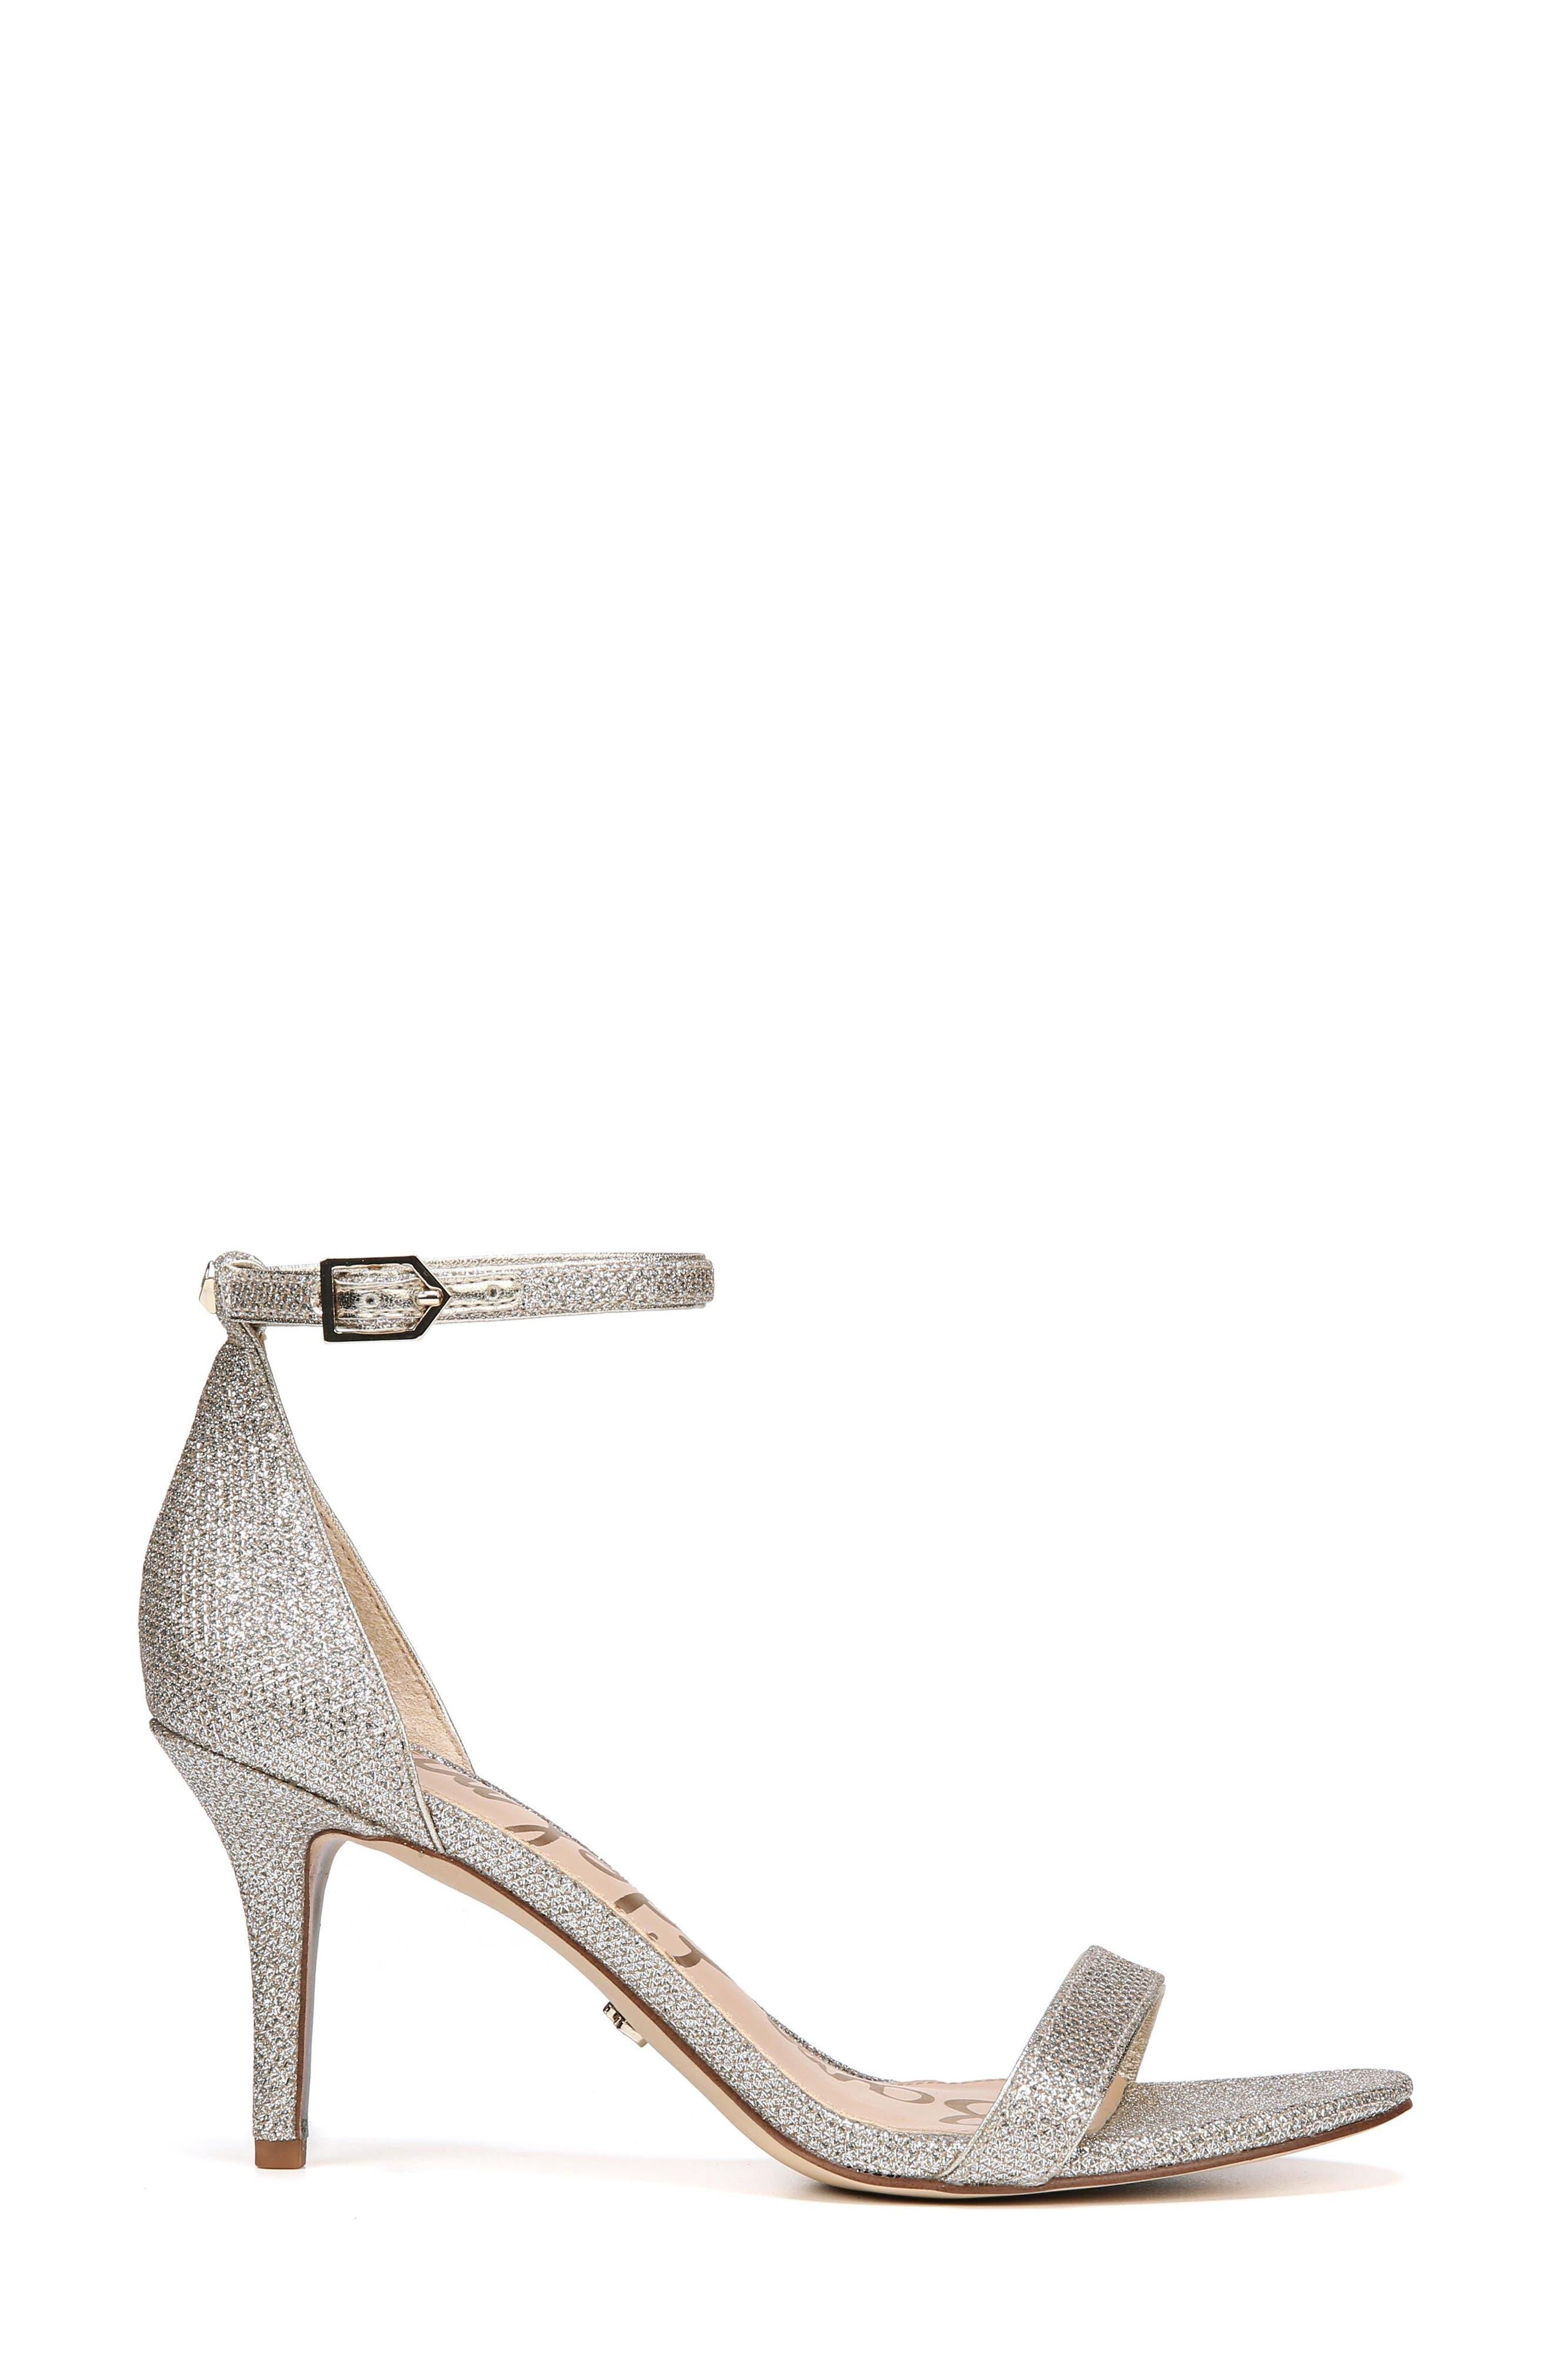 ,                             'Patti' Ankle Strap Sandal,                             Alternate thumbnail 41, color,                             042